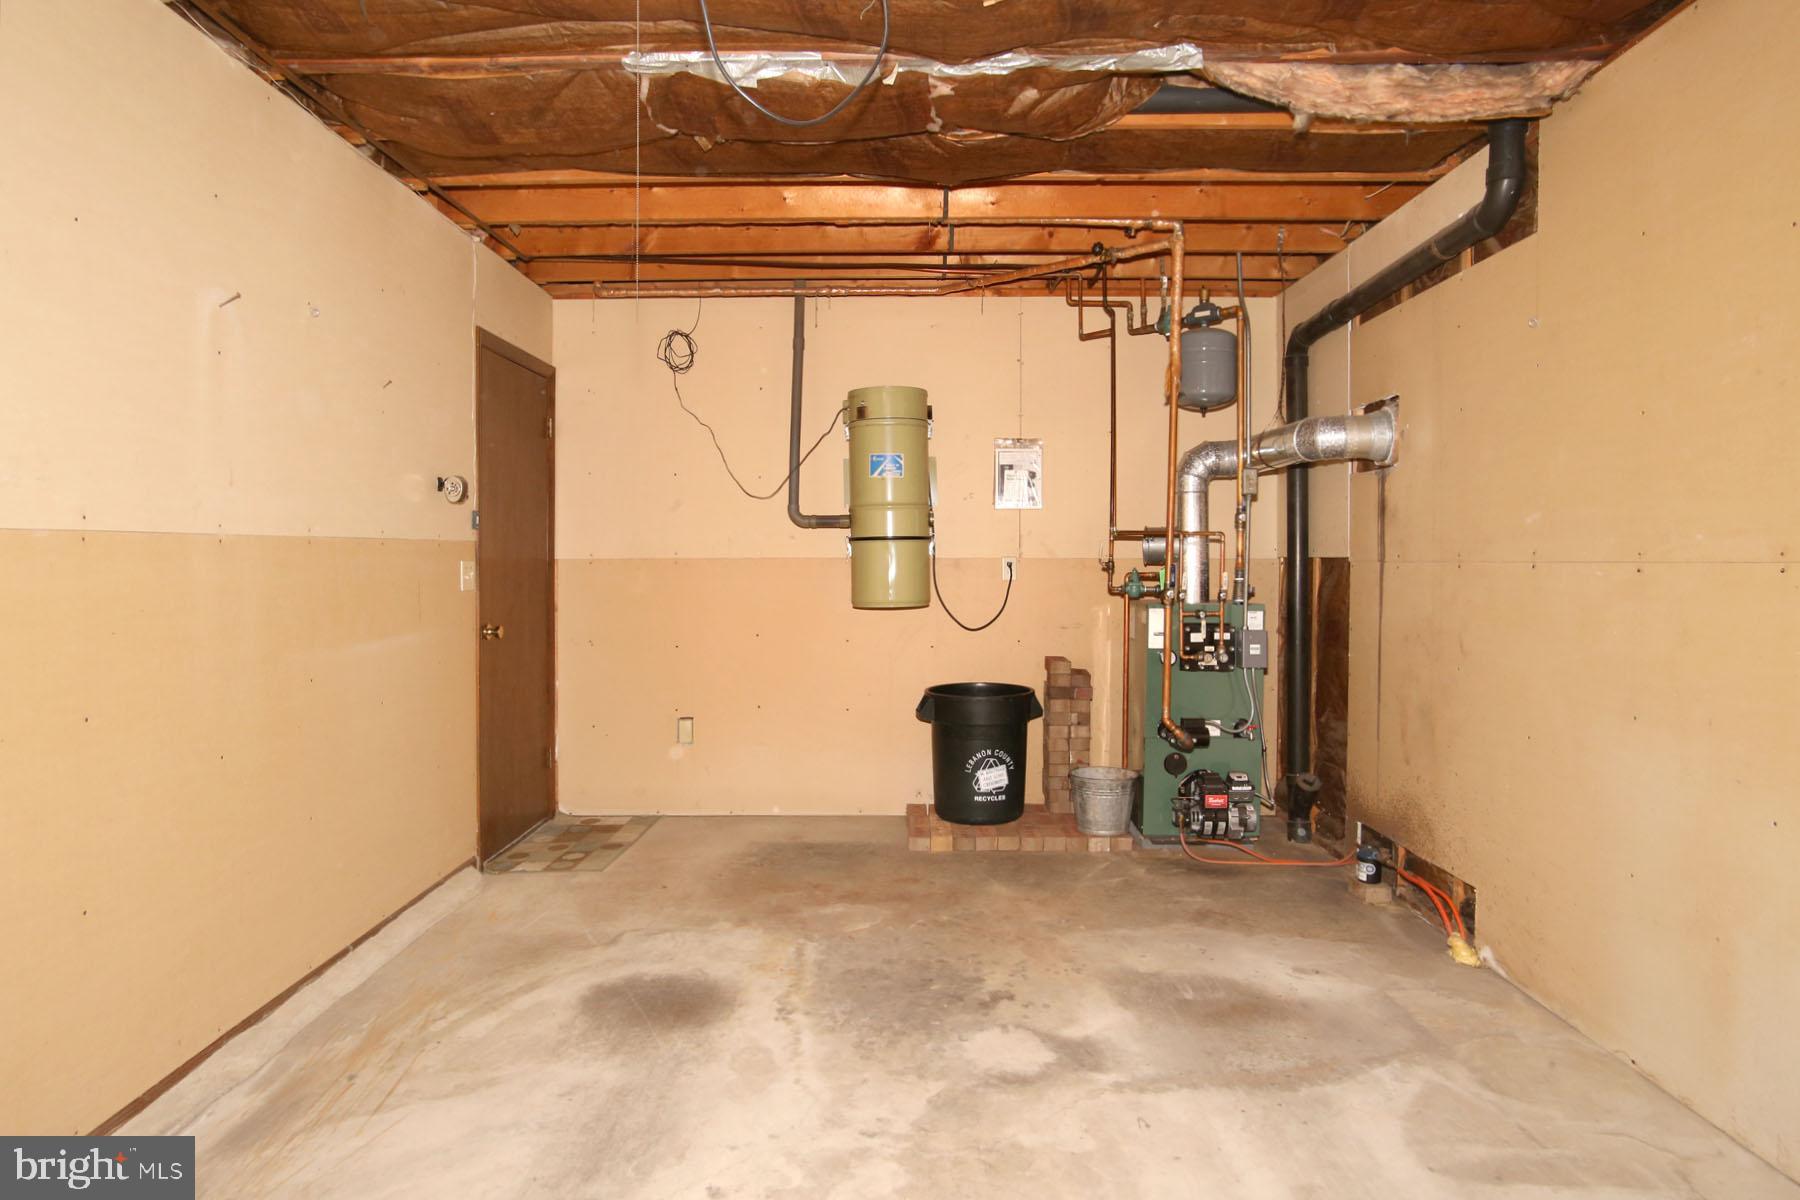 Garage view 2 - Central Vac/boiler